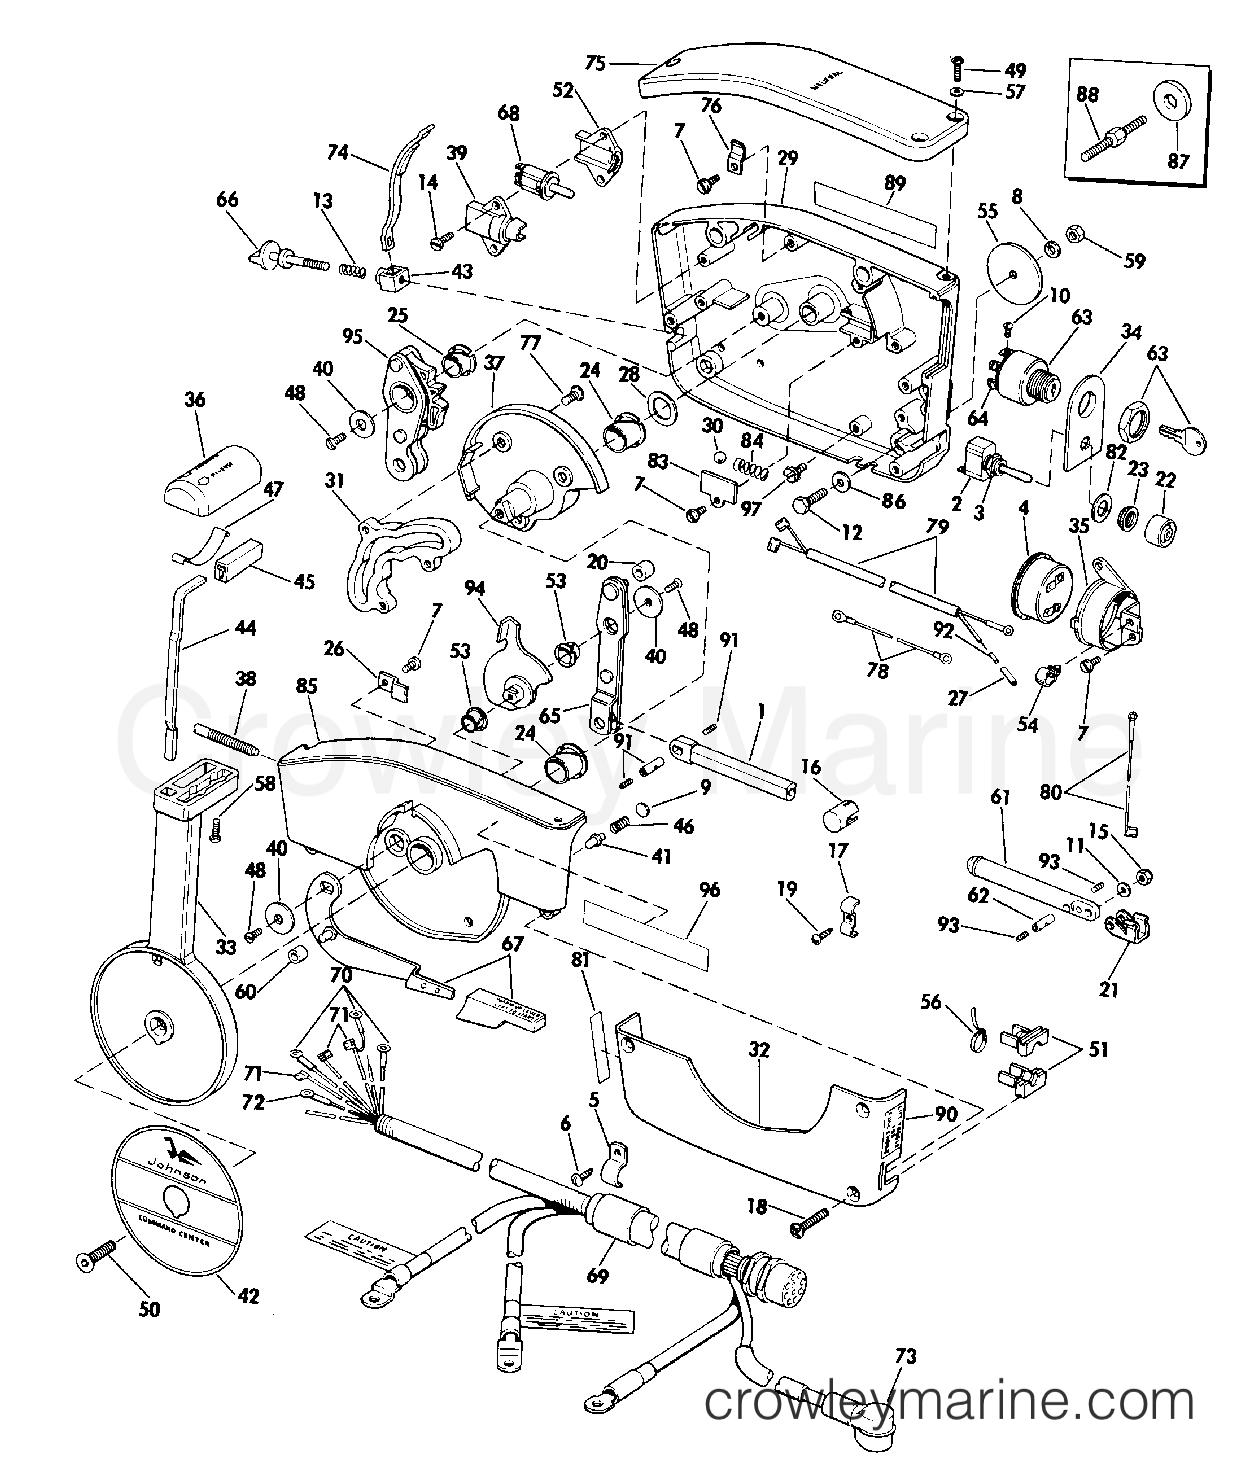 johnson outboard motor diagram � remote control